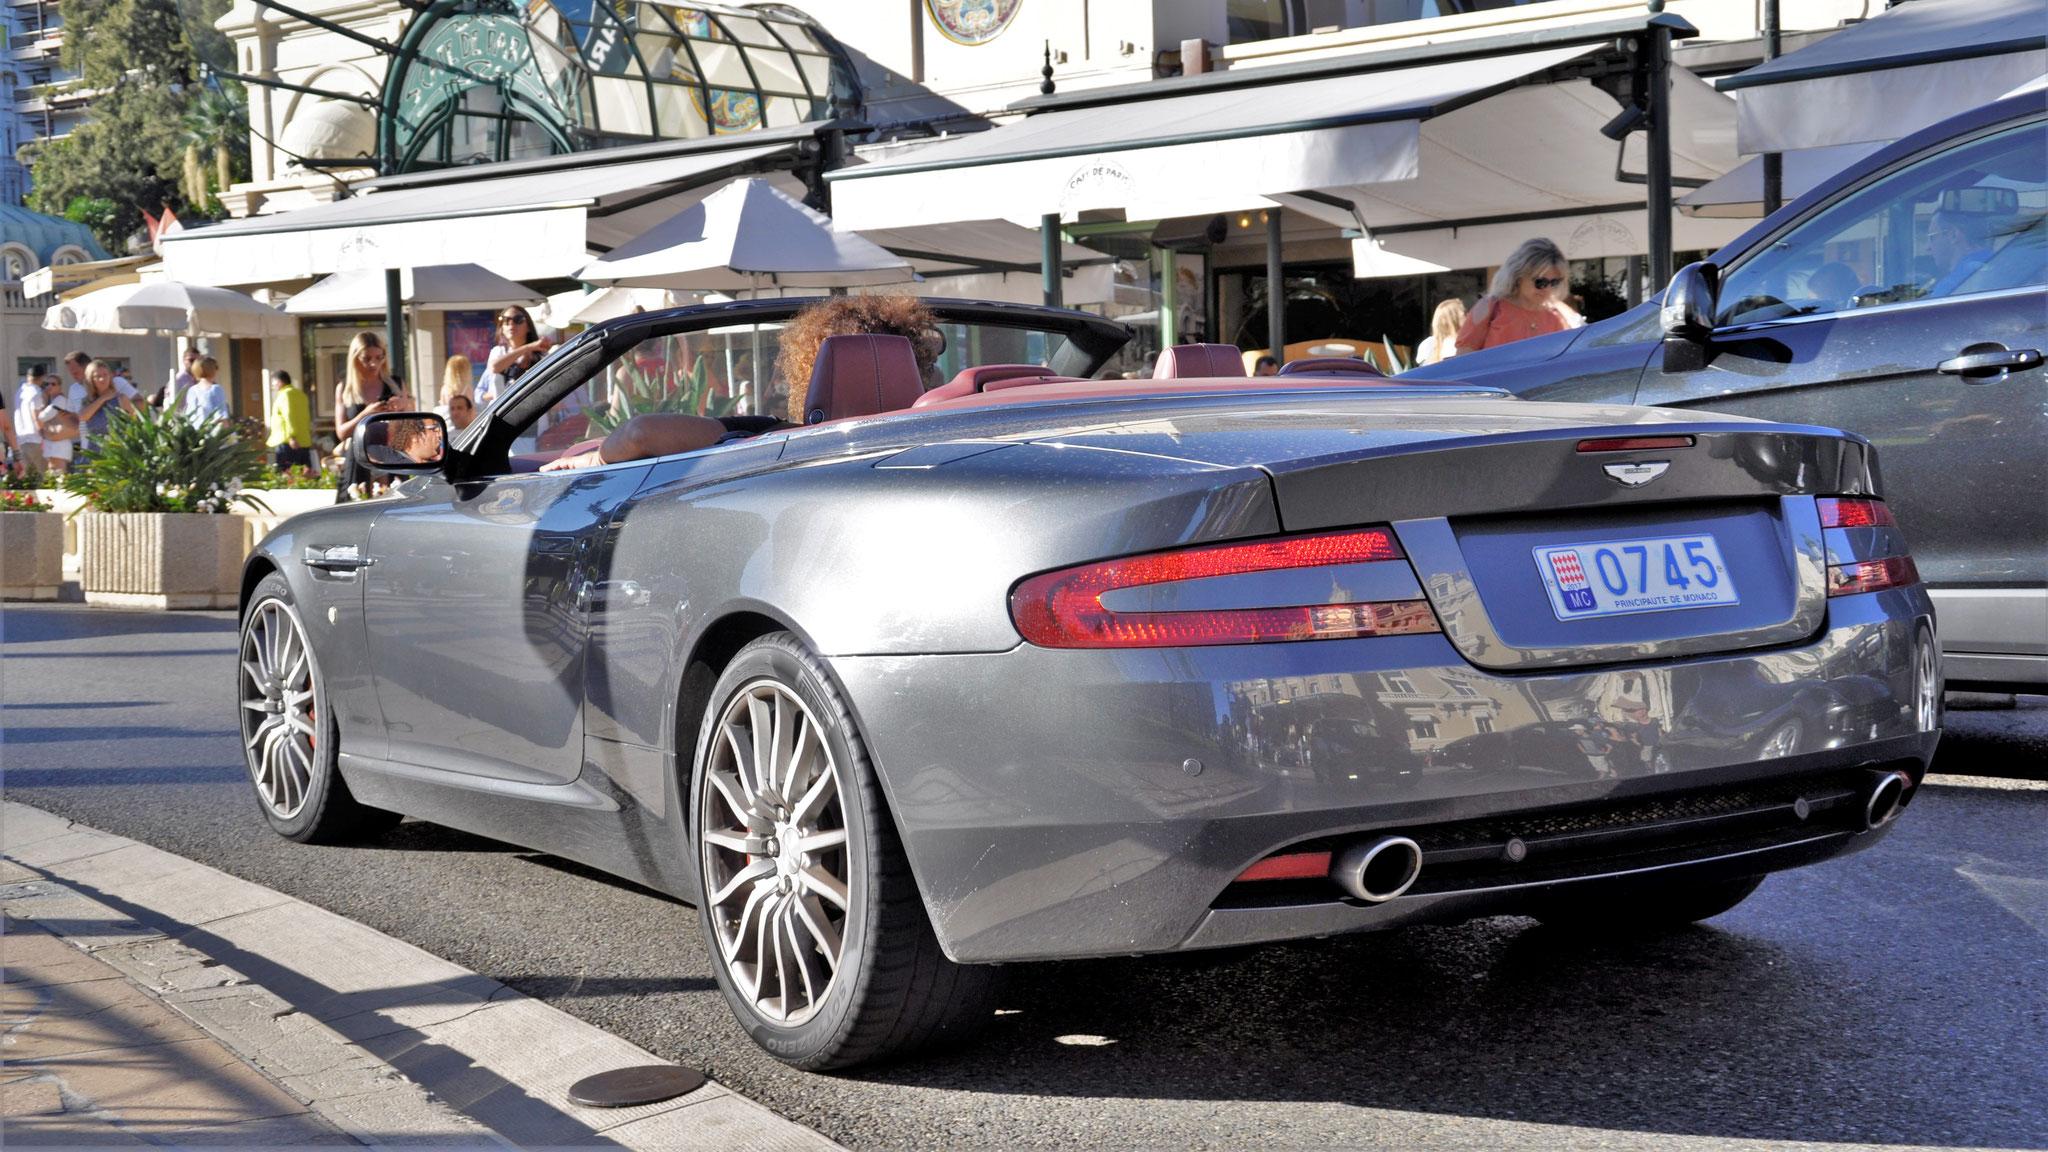 Aston Martin DB9 Volante - 0745 (MC)